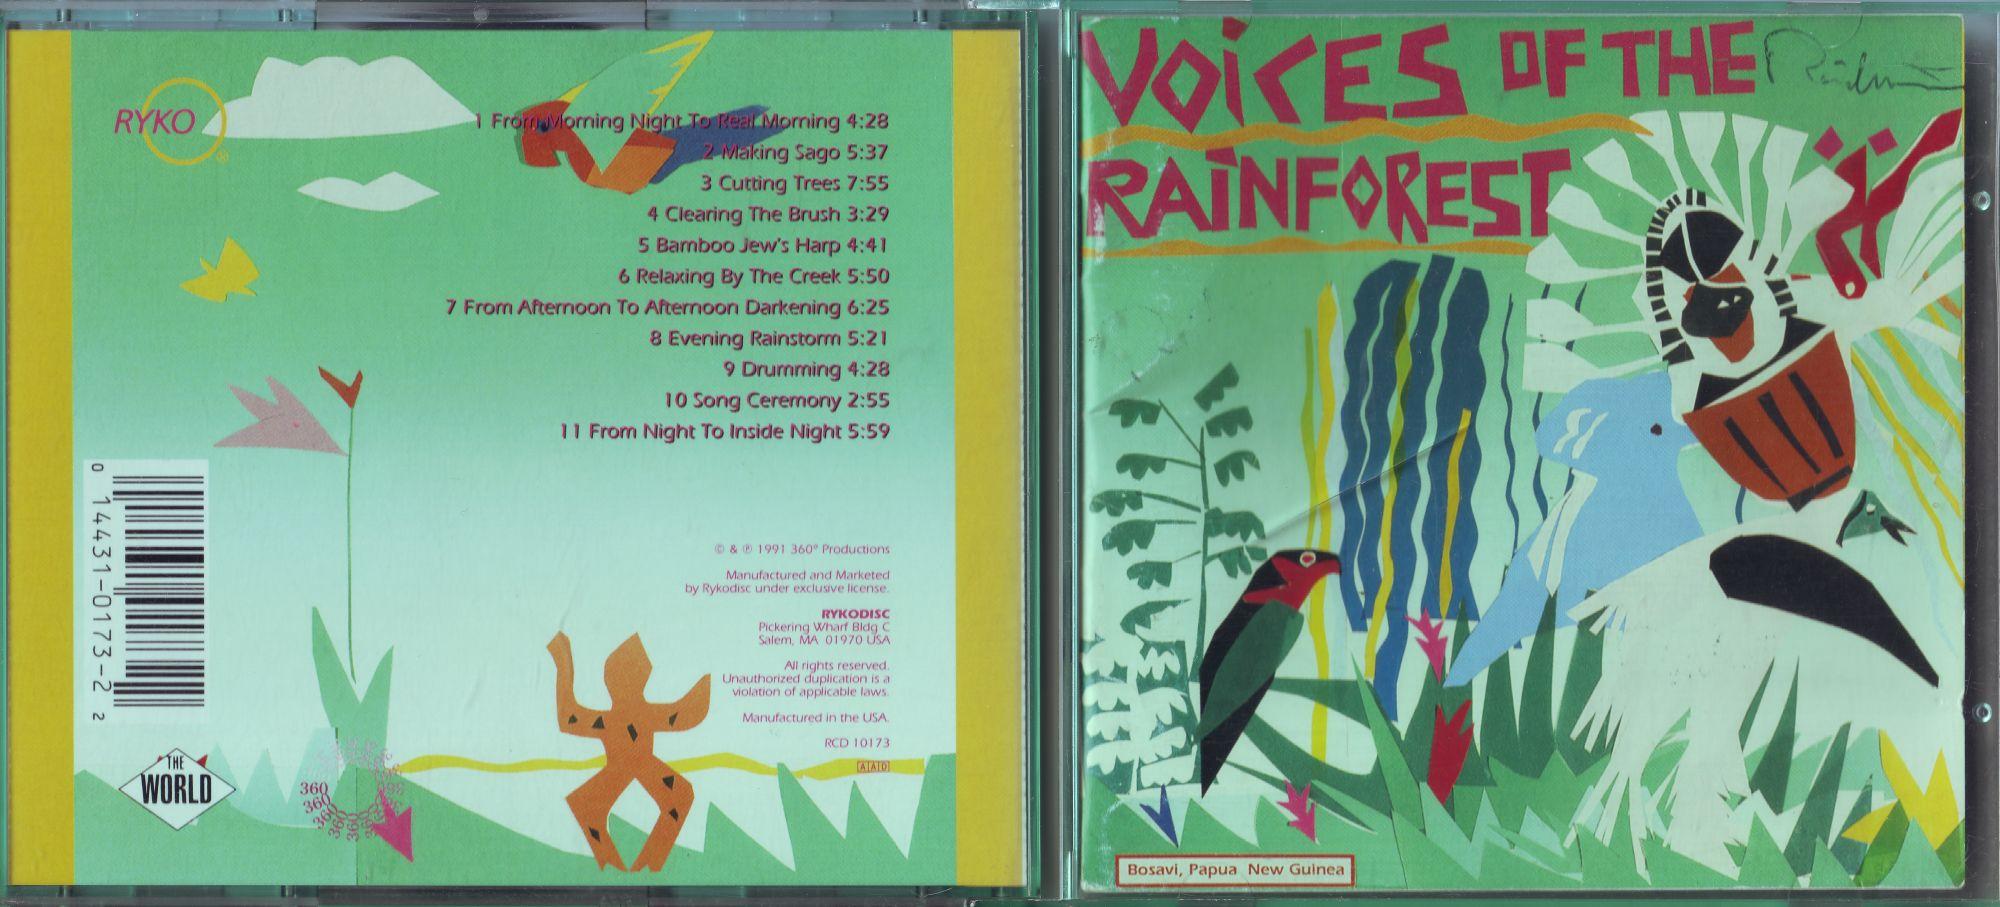 Kaluli - Voices Of The Rainforest